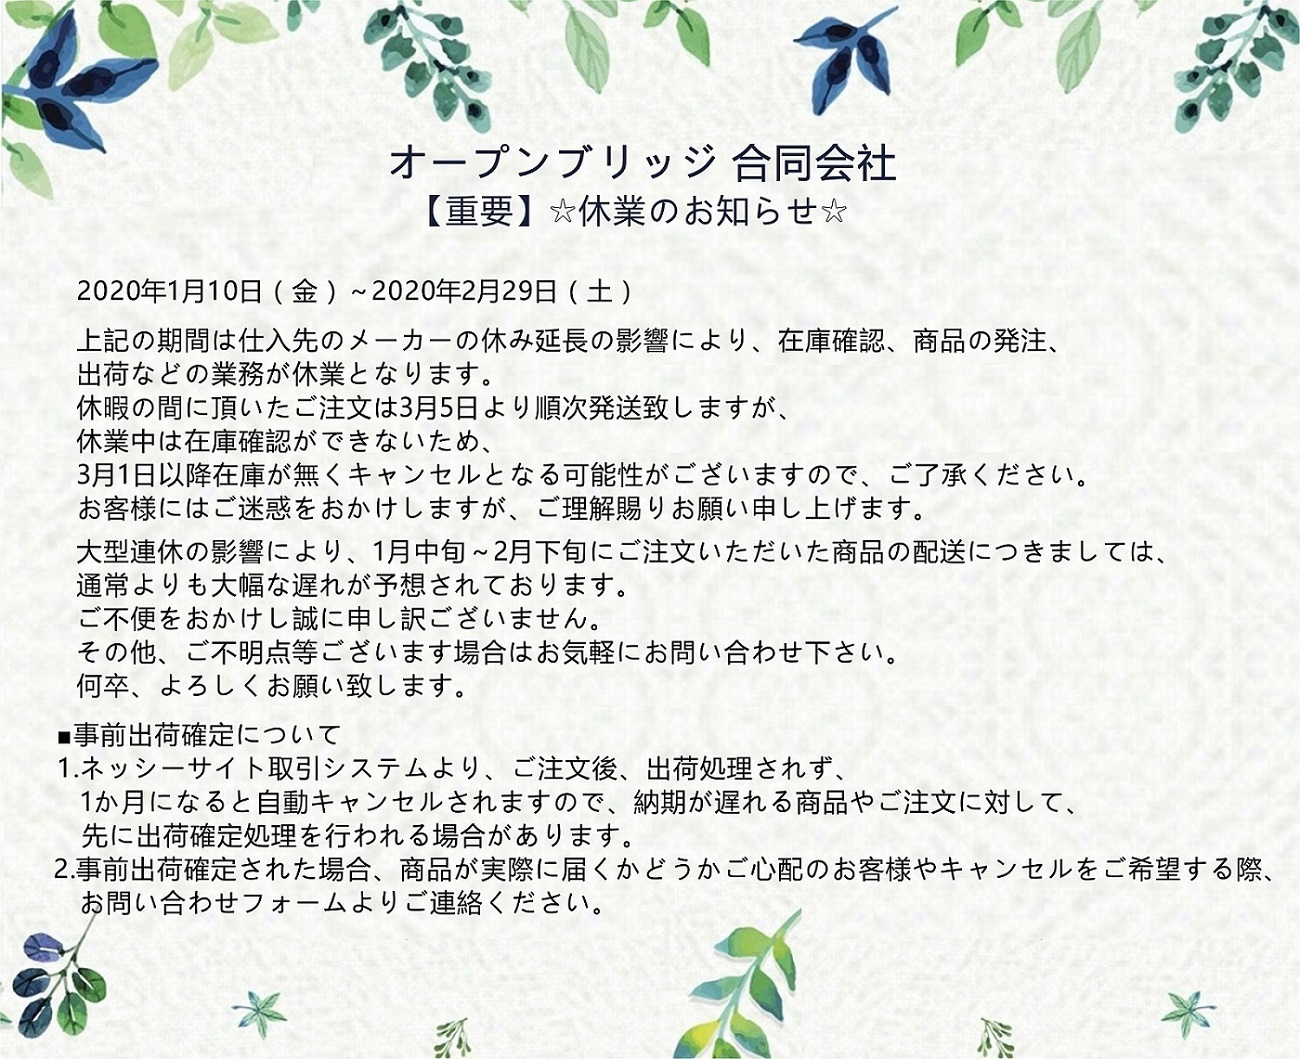 https://img01.netsea.jp/ex12/20200214/4/11046484_9.jpg